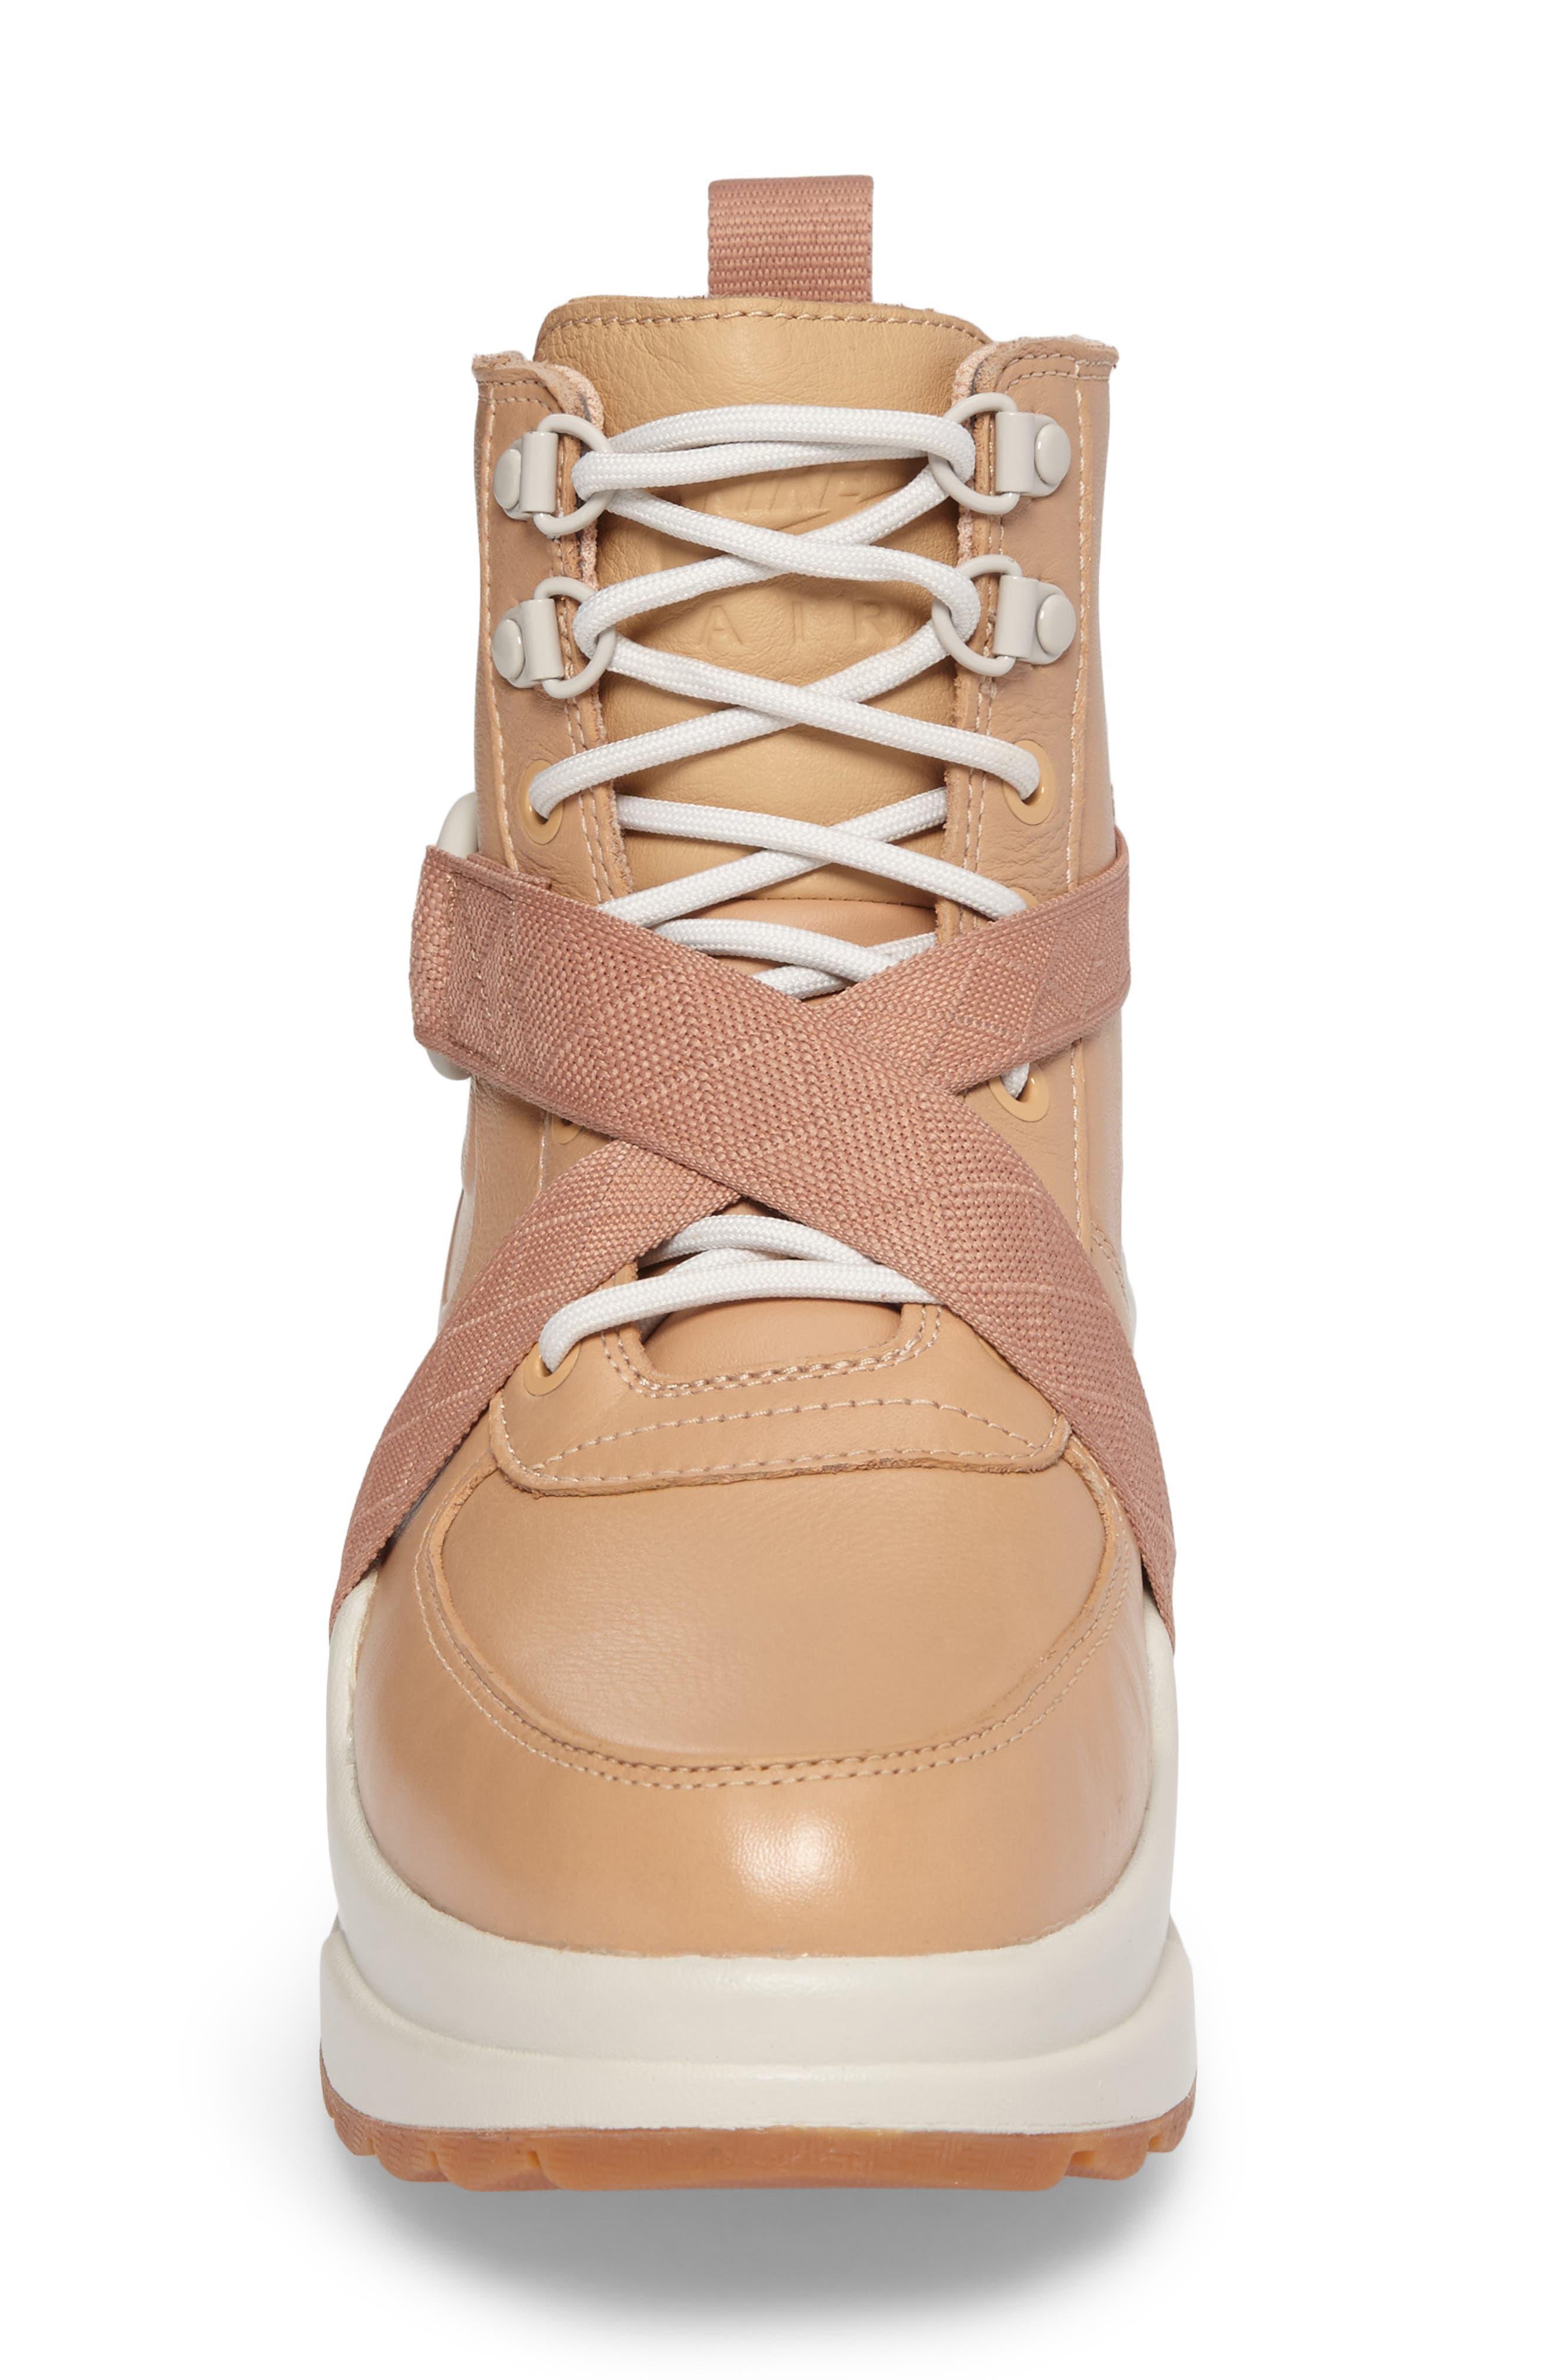 Air Max Goadome Sneaker Boot,                             Alternate thumbnail 4, color,                             Tan/ Tan/ Light Bone/ Clay